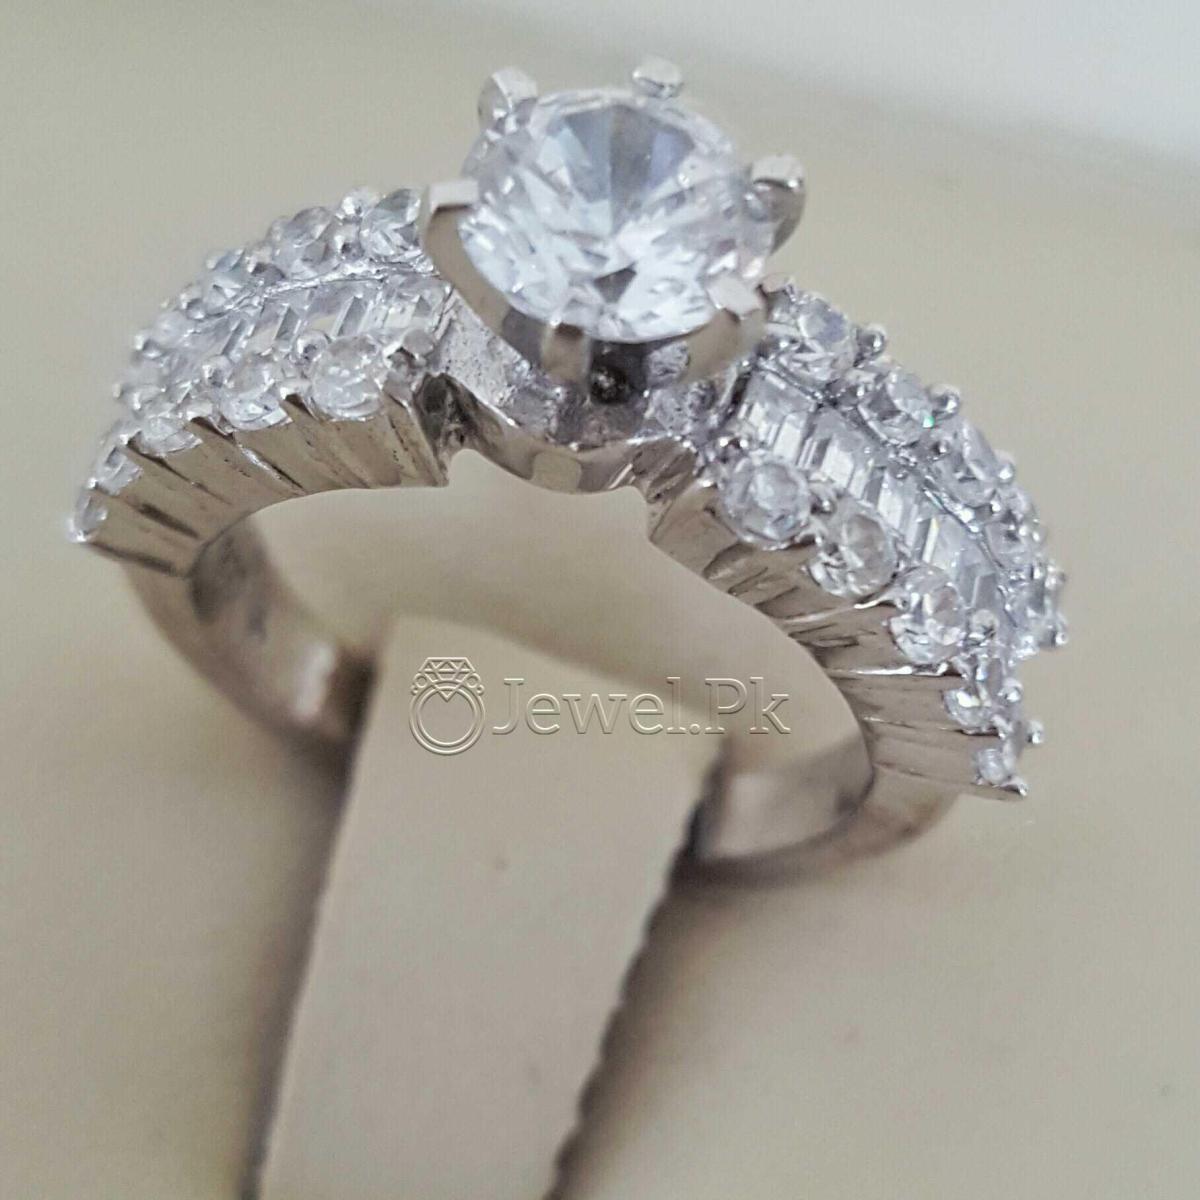 925 Silver Luxury Rings for Ladies Women Silver Rings Woman Handmade Rings 45 natural gemstones pakistan + 925 silver jewelry online